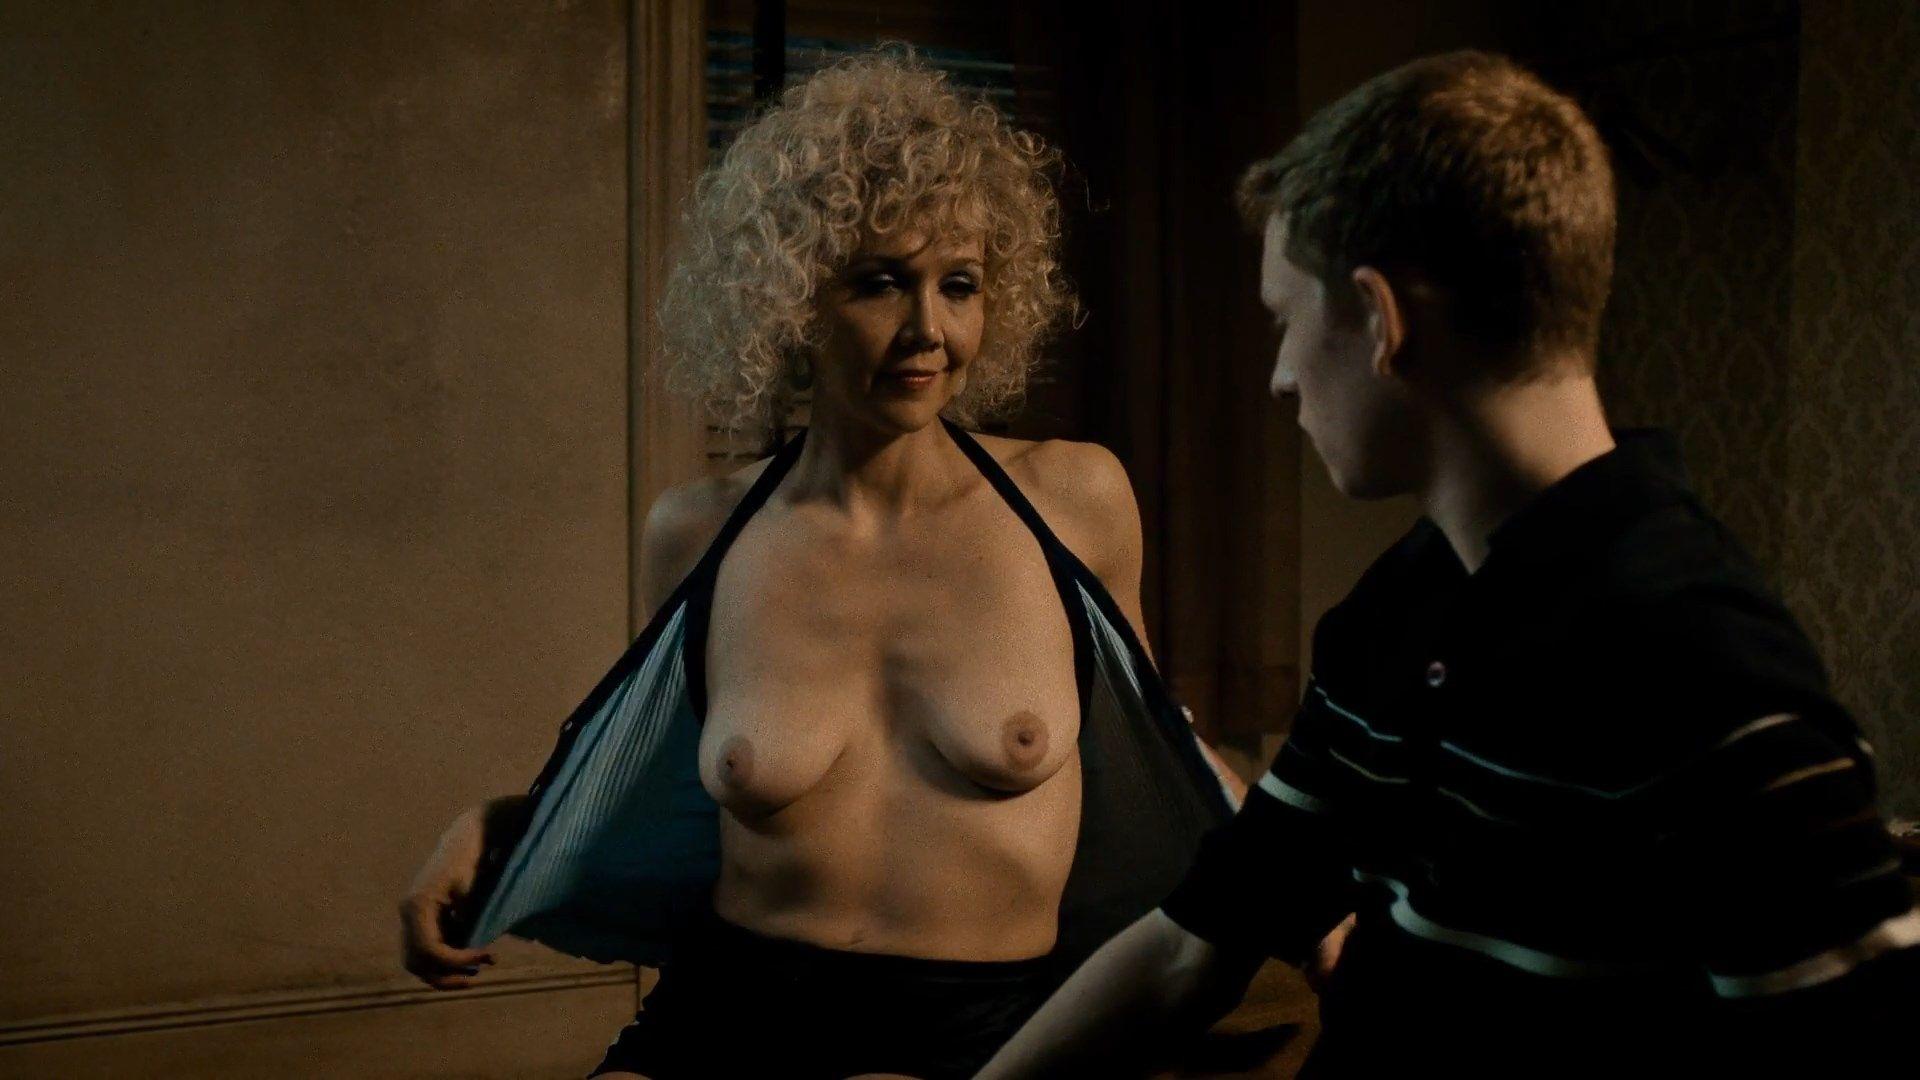 Amateur Allure Goldie maggie gyllenhaal nude video . hot nude photos.